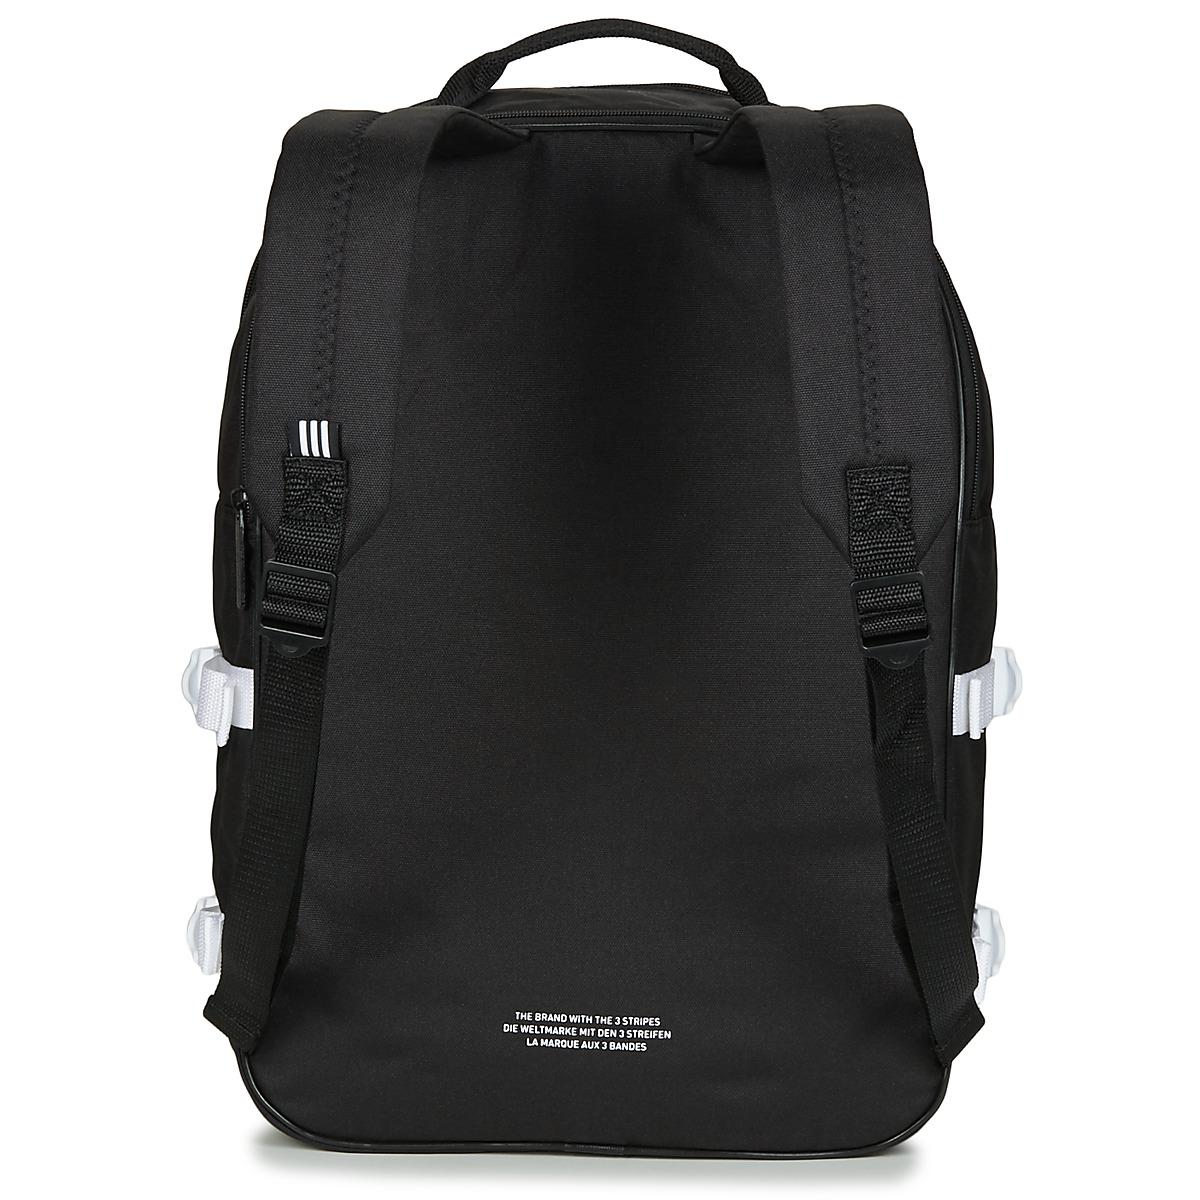 Adidas - Bp Essential Men s Backpack In Black for Men - Lyst. View  fullscreen 5f6eb1621736a